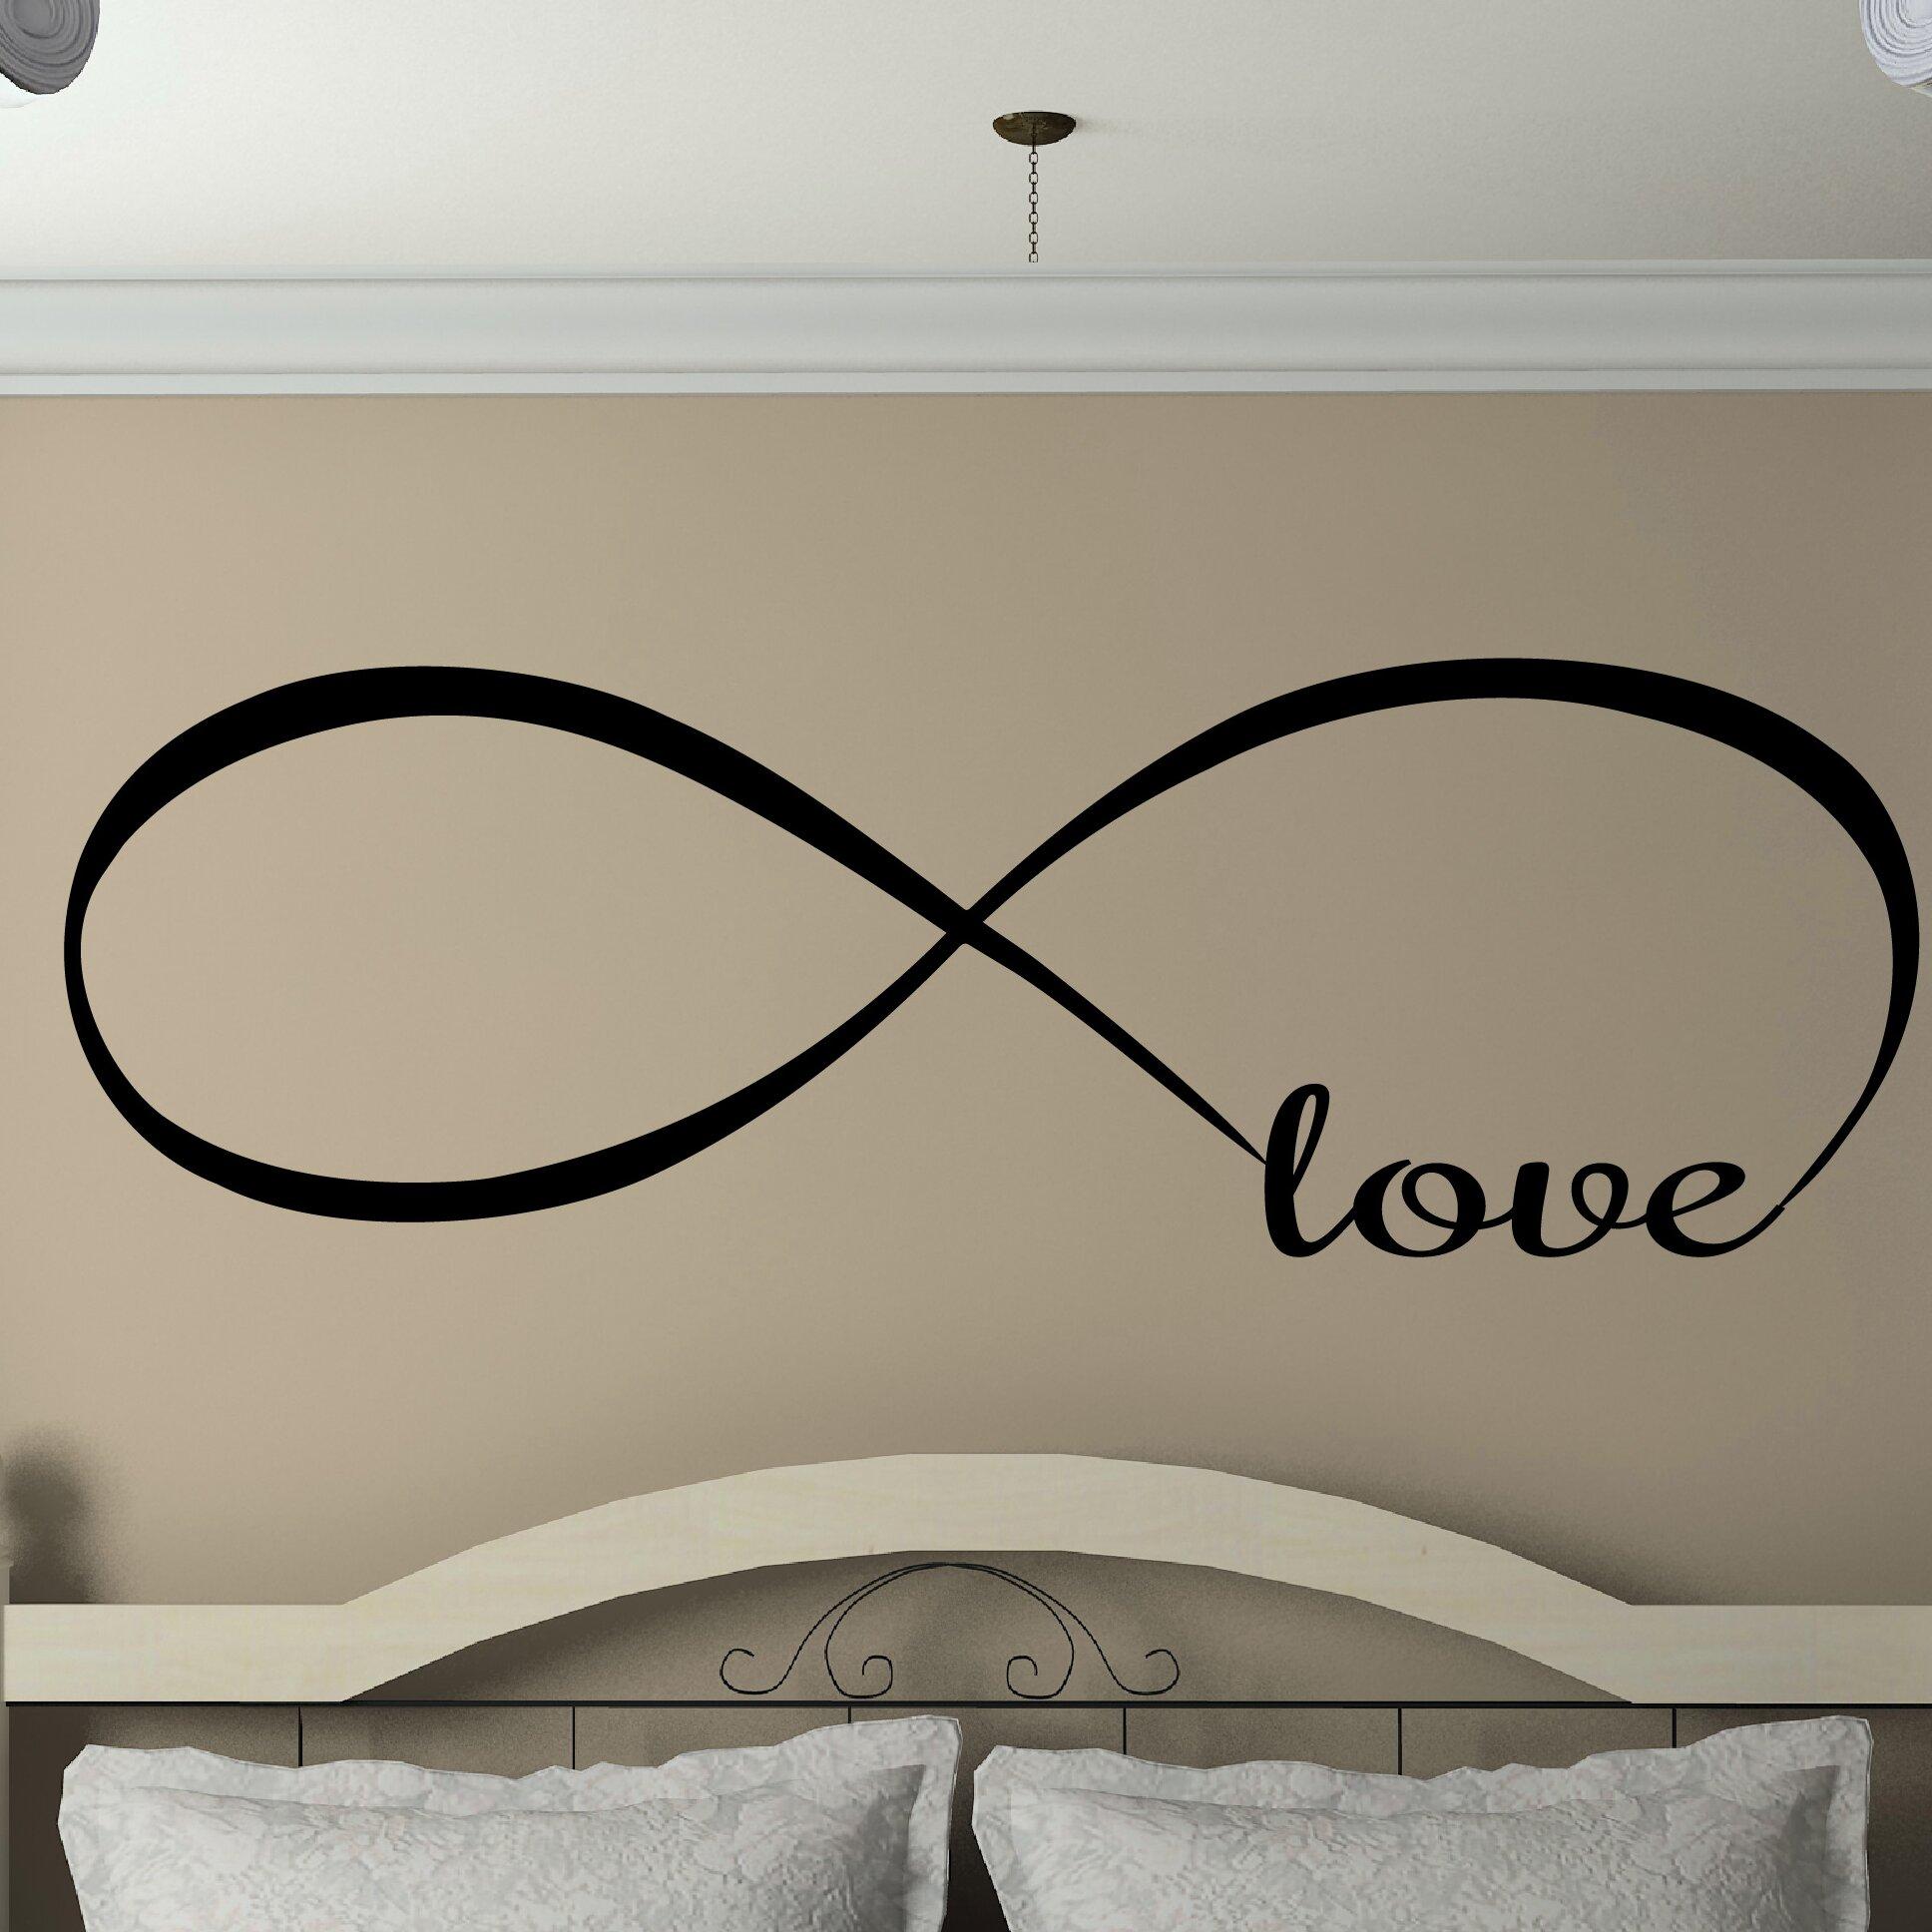 Davis vinyl designs infinity love wall decal reviews for Vinyl window designs complaints